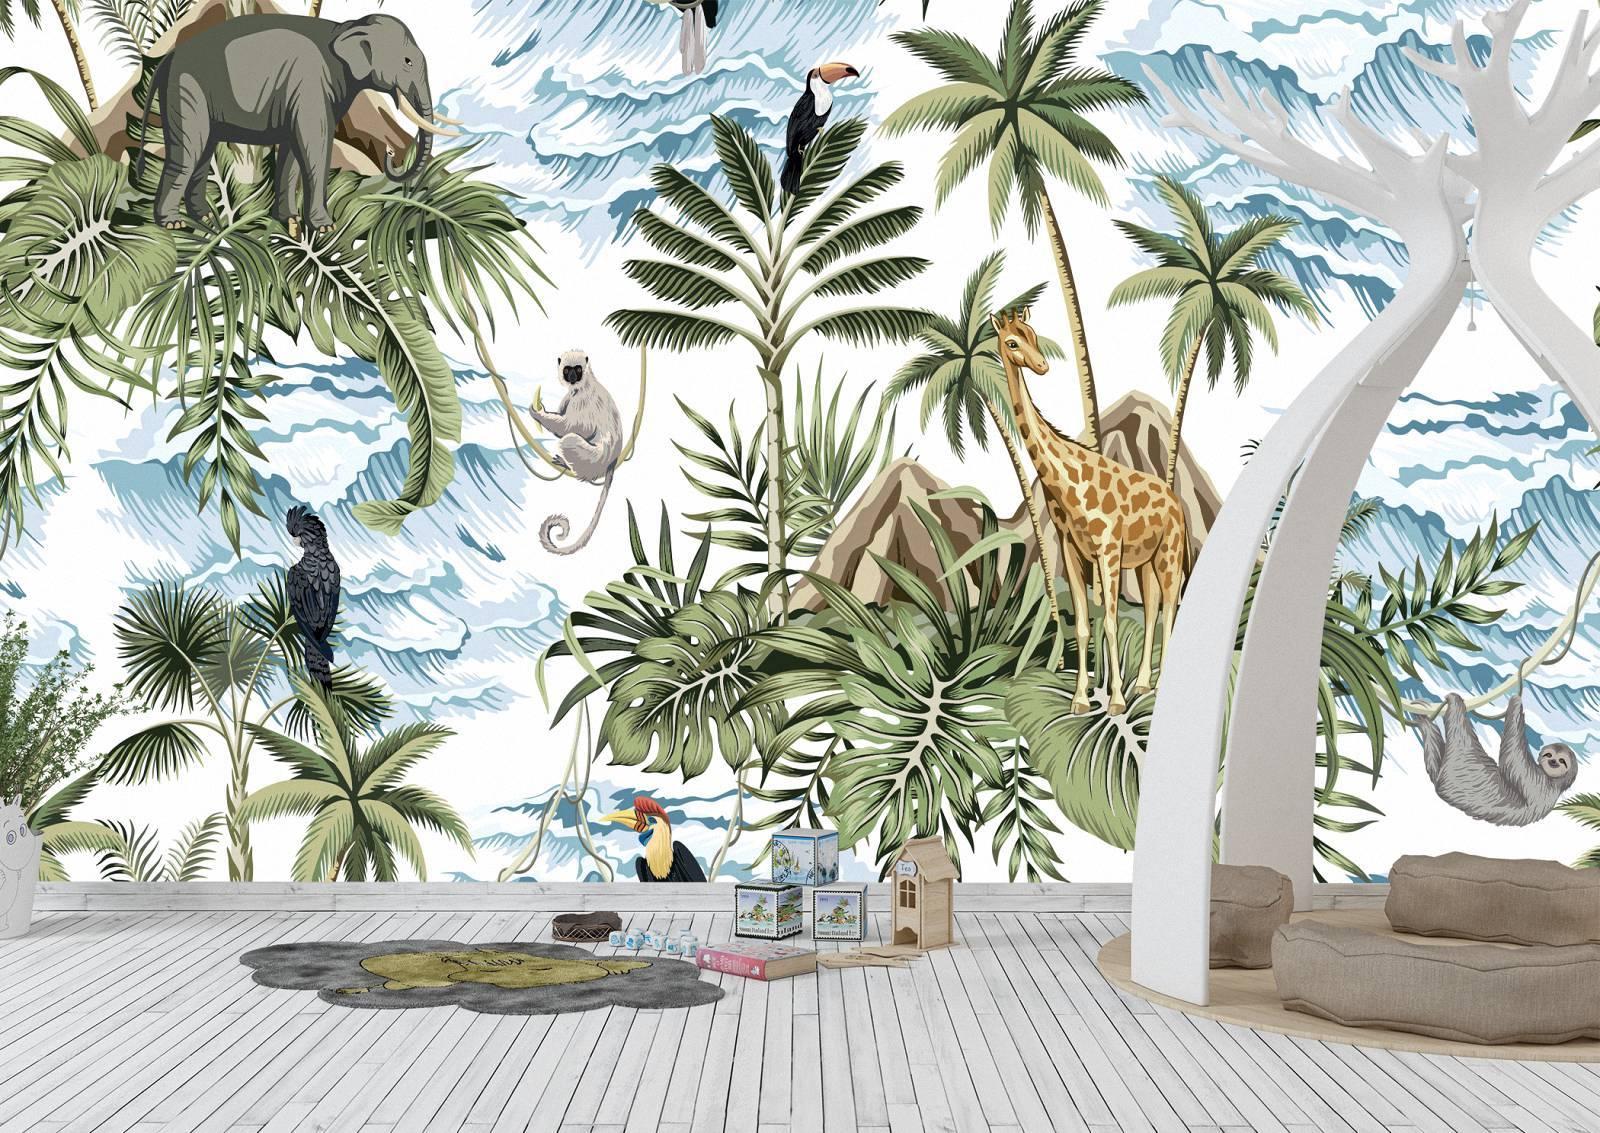 African Animals Theme Wall Mural Photo Wallpaper UV Print Decal Art Décor